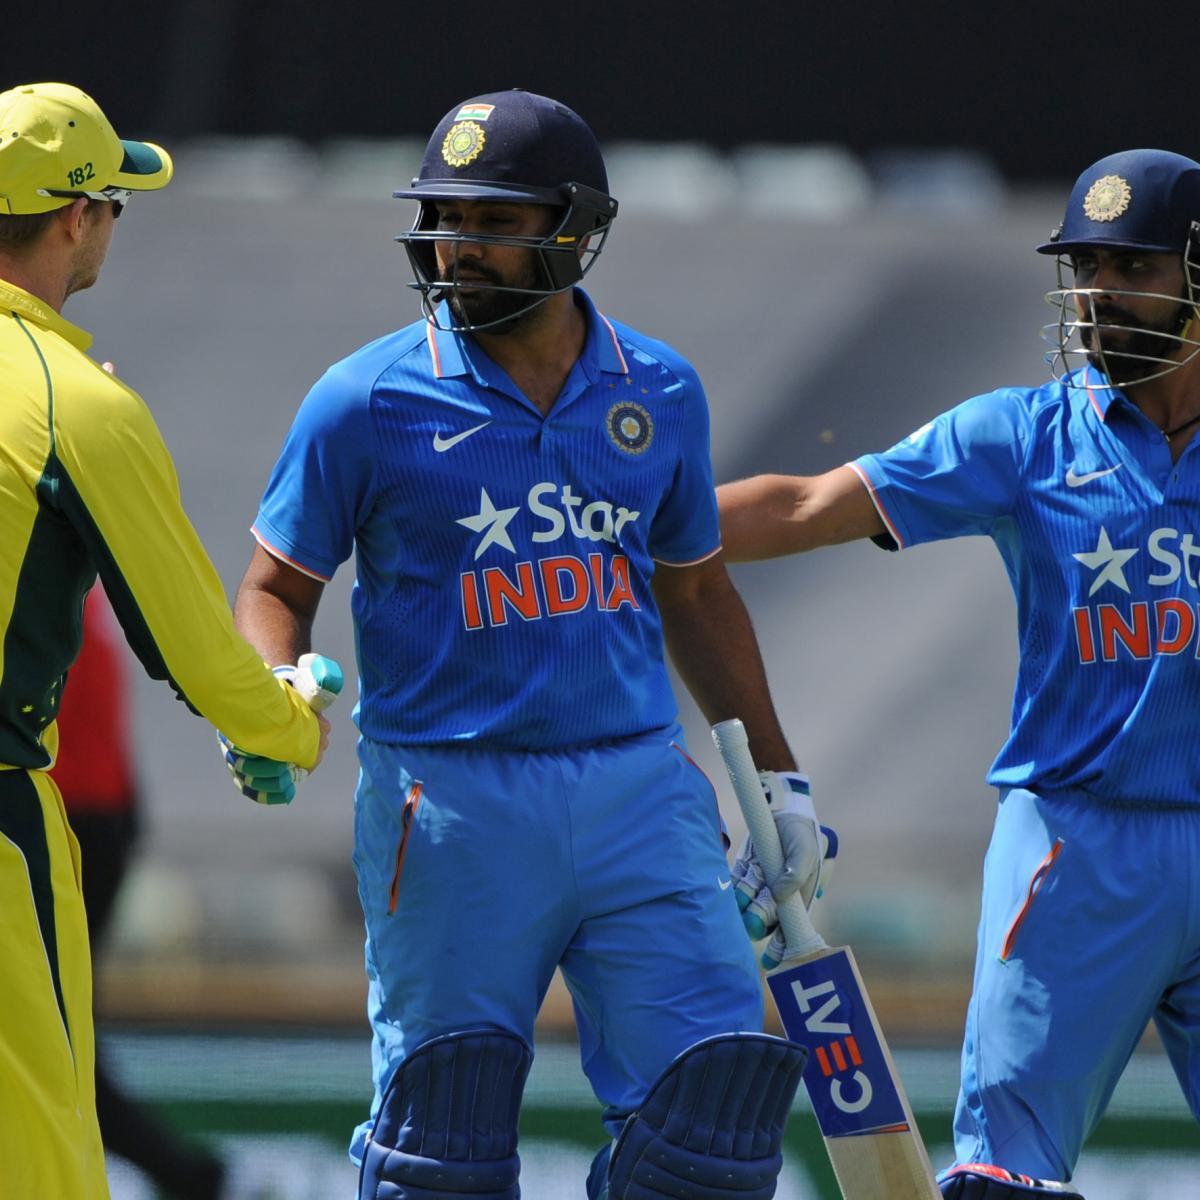 Australia Vs. India, 2nd ODI: Date, Time, Live Stream, TV